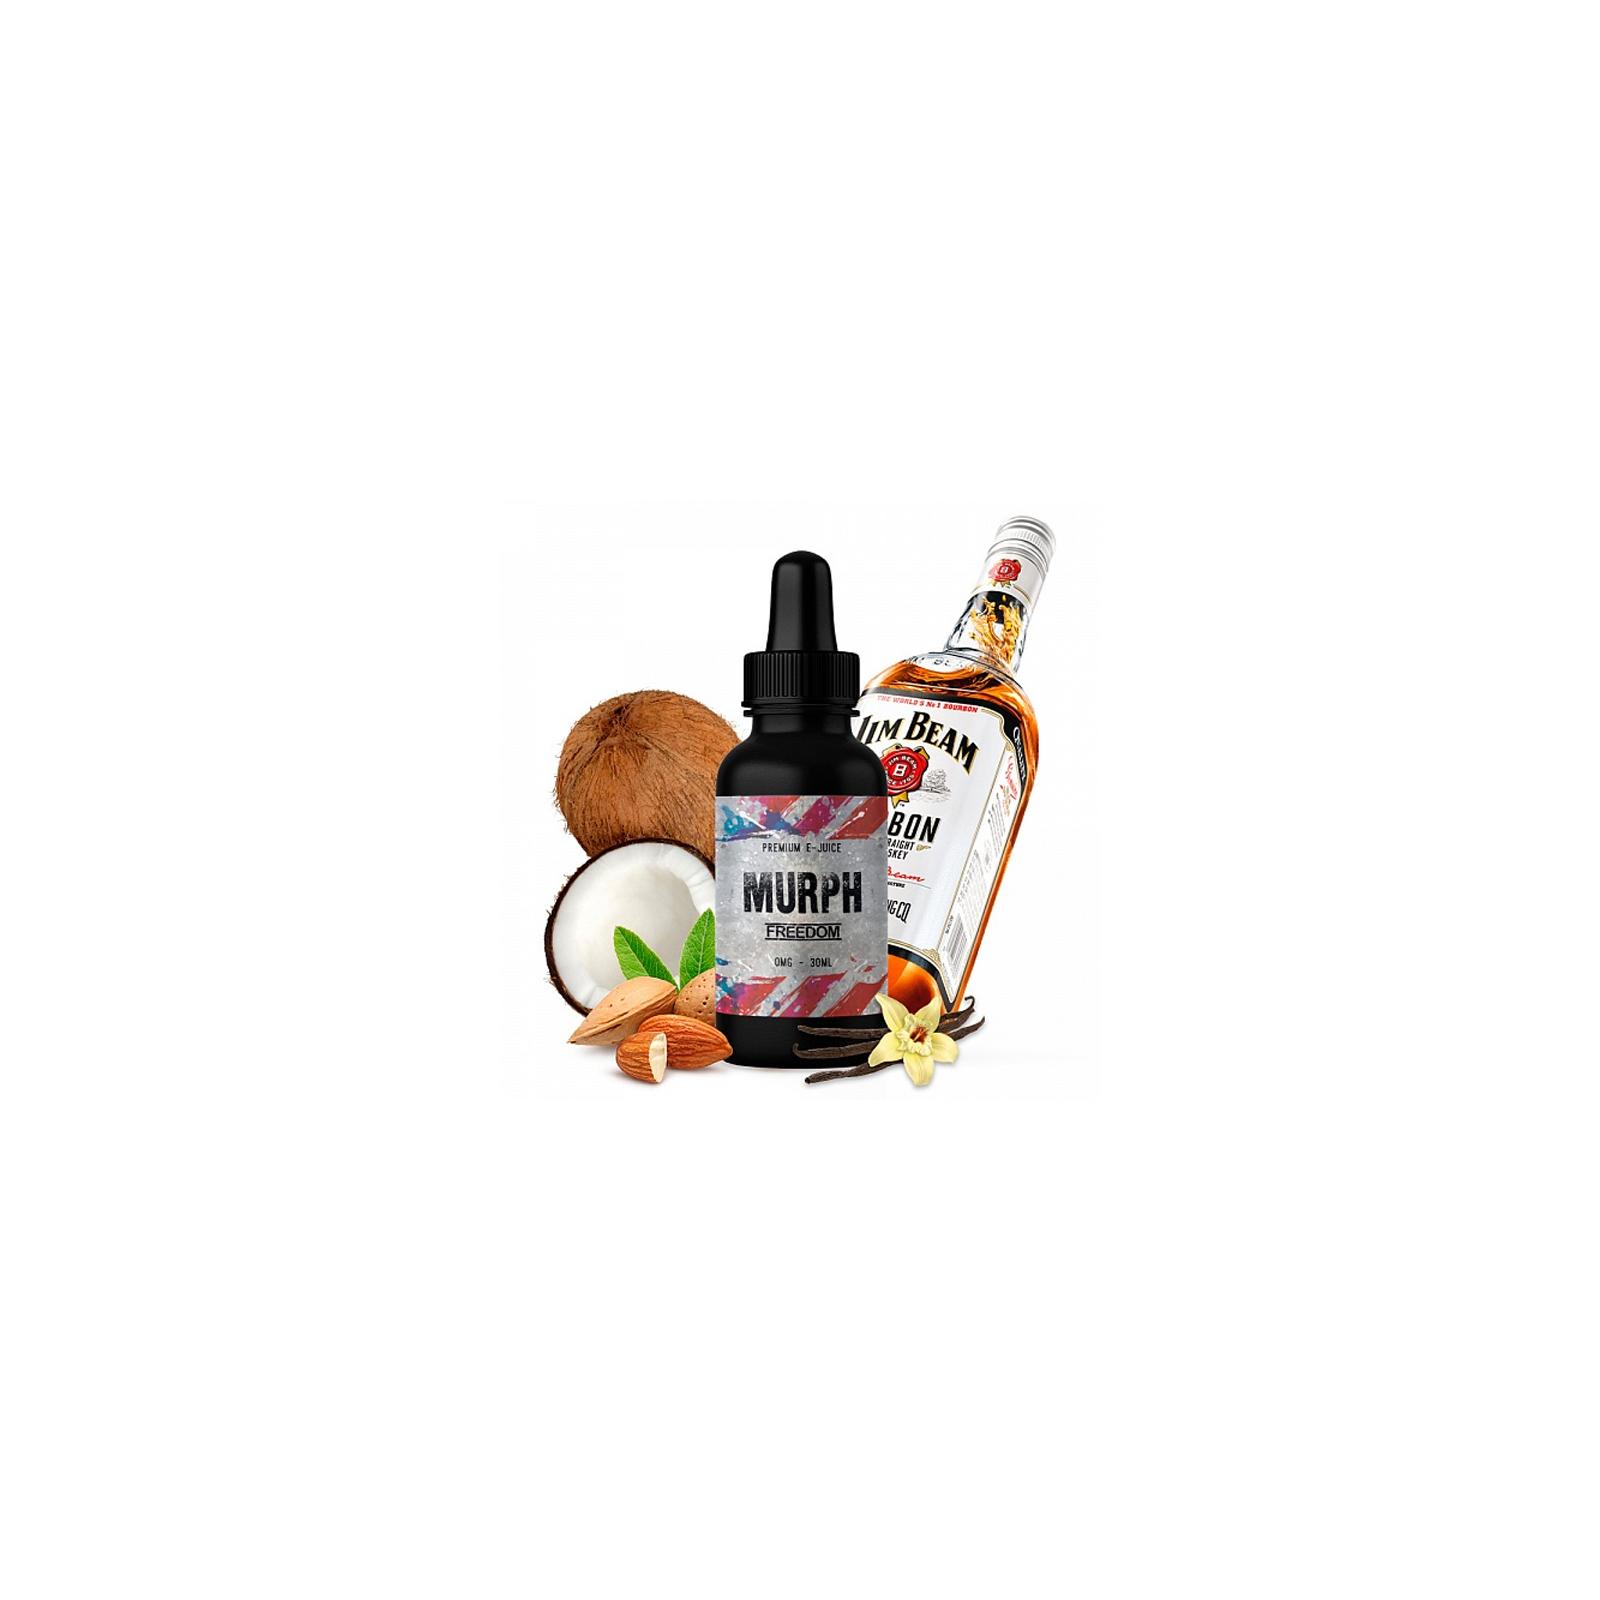 "Жидкость для электронных сигарет Murph ""Freedom"" 30 ml 0 мг/мл (MP-FR-30-0)"